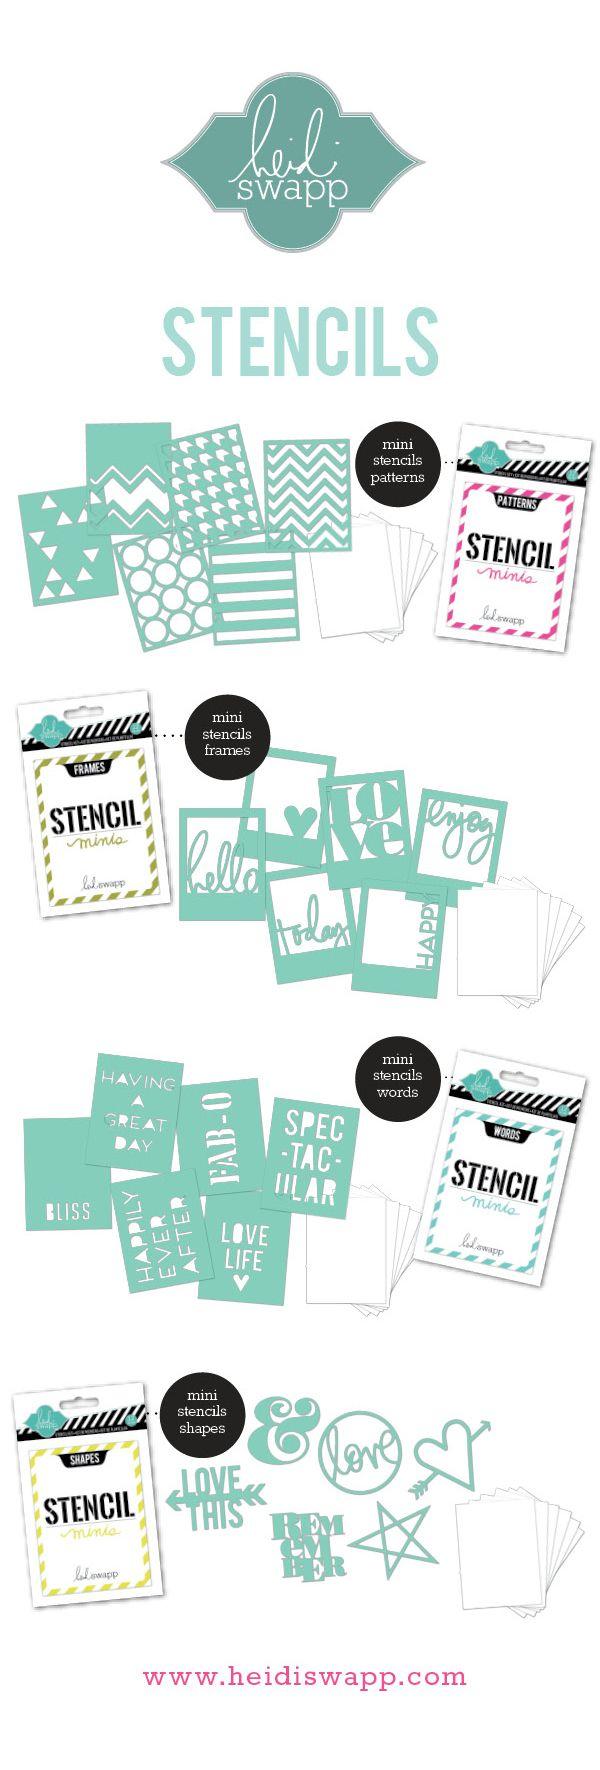 #HeidiSwapp NEW Stencil Minis shipping March 2014 #stencilmagic